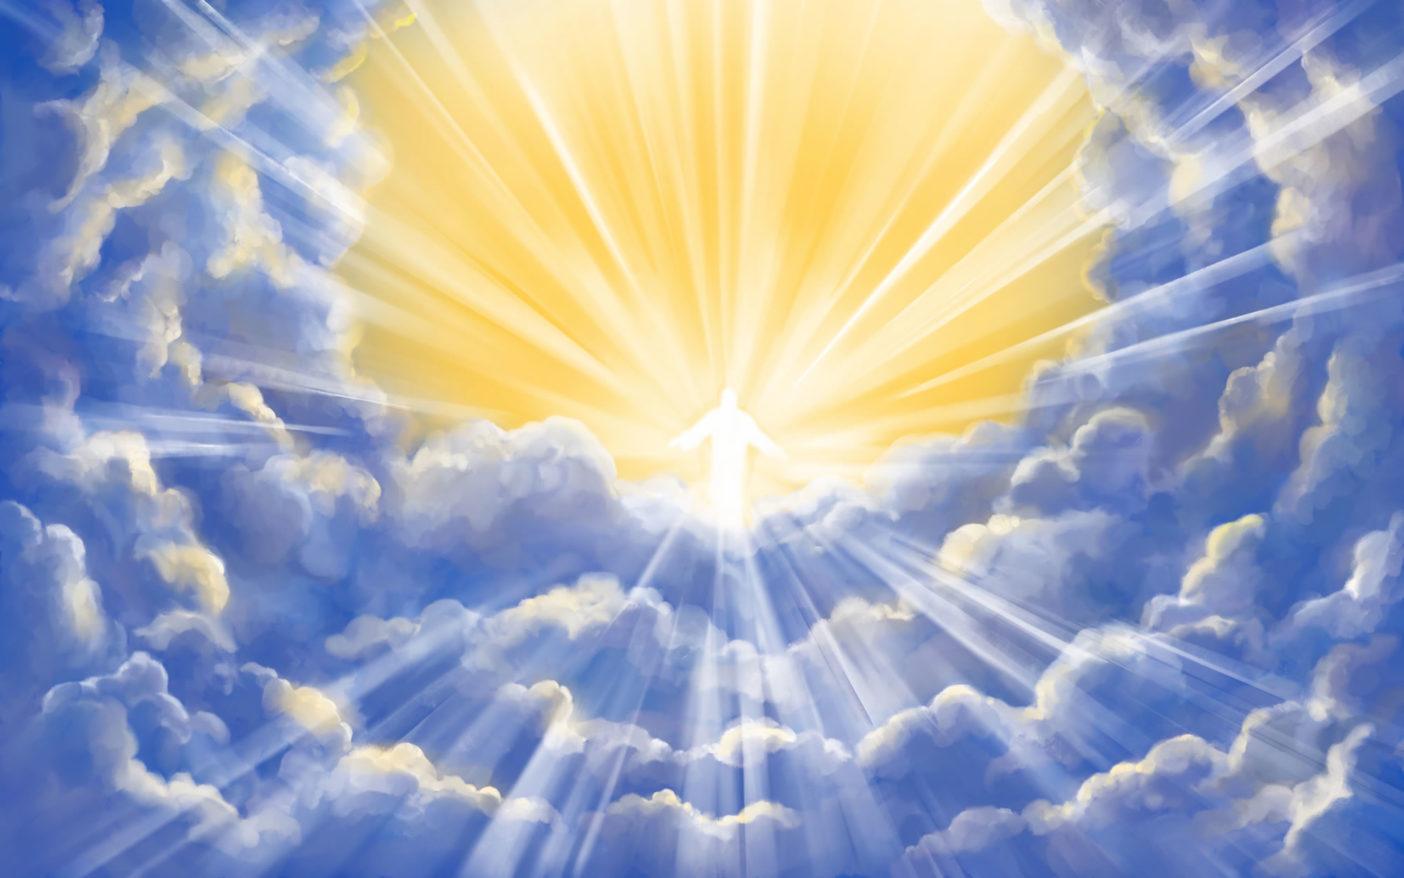 A hit hősei: Énok